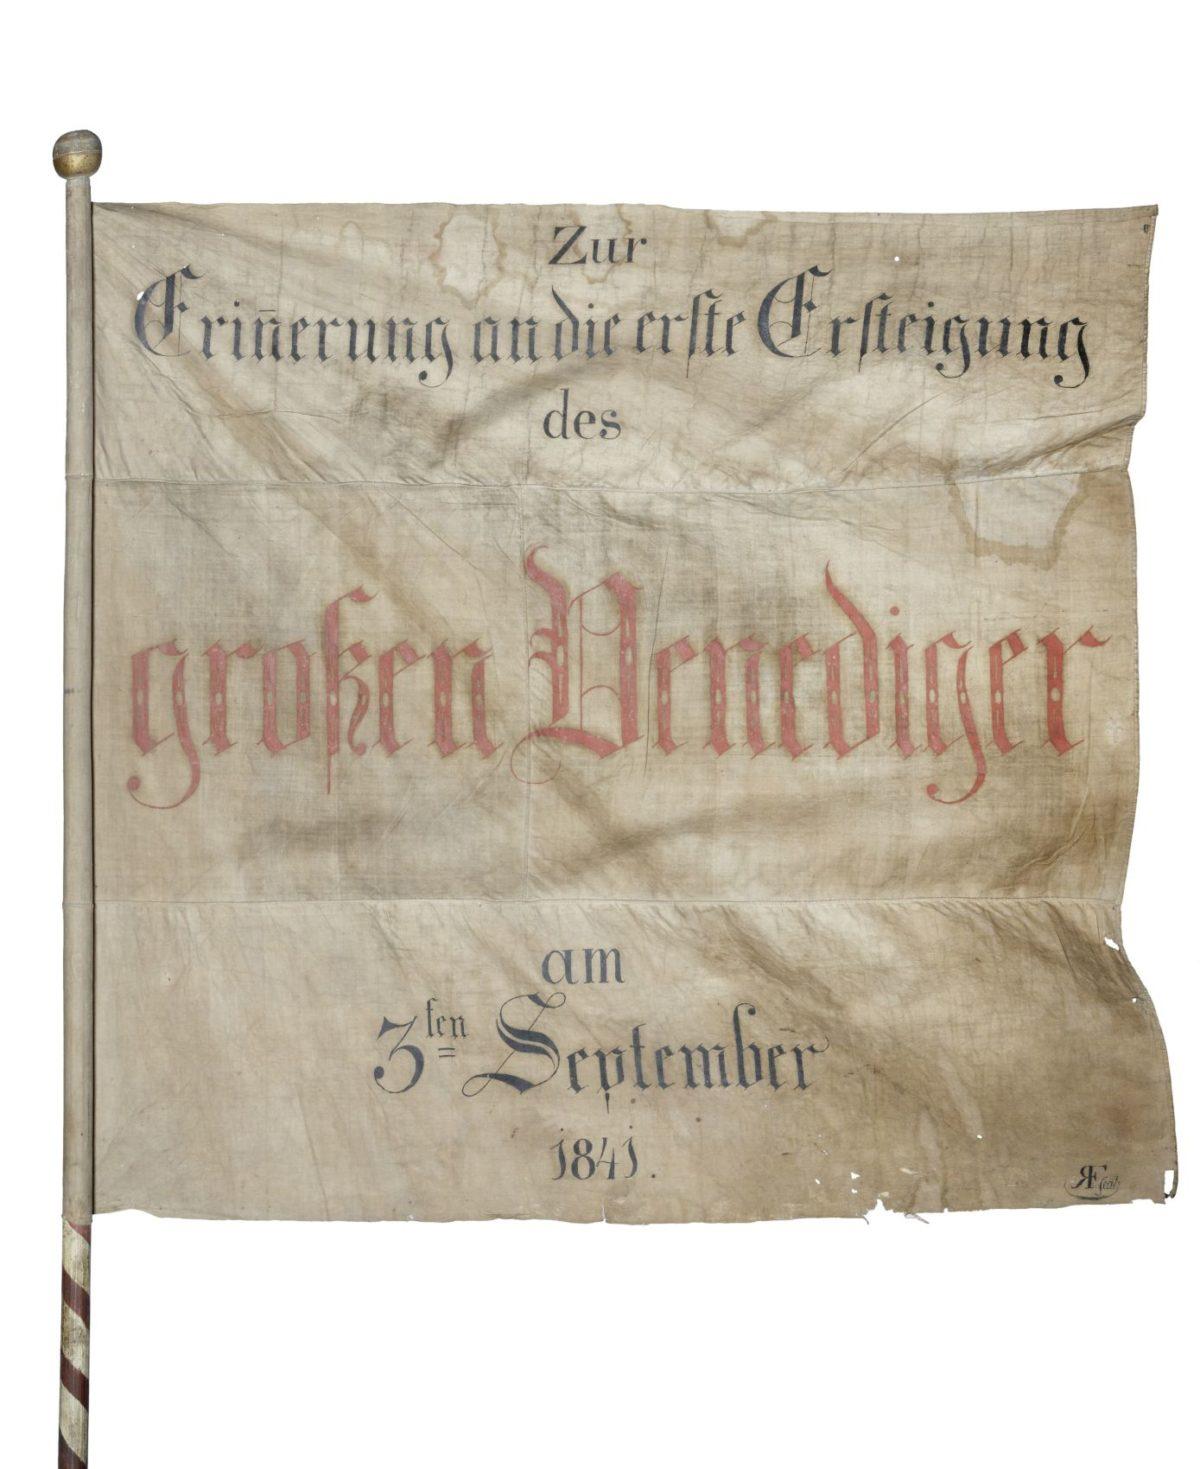 Fahne der Erstbesteigung des Großvenedigers am 3. September 1841